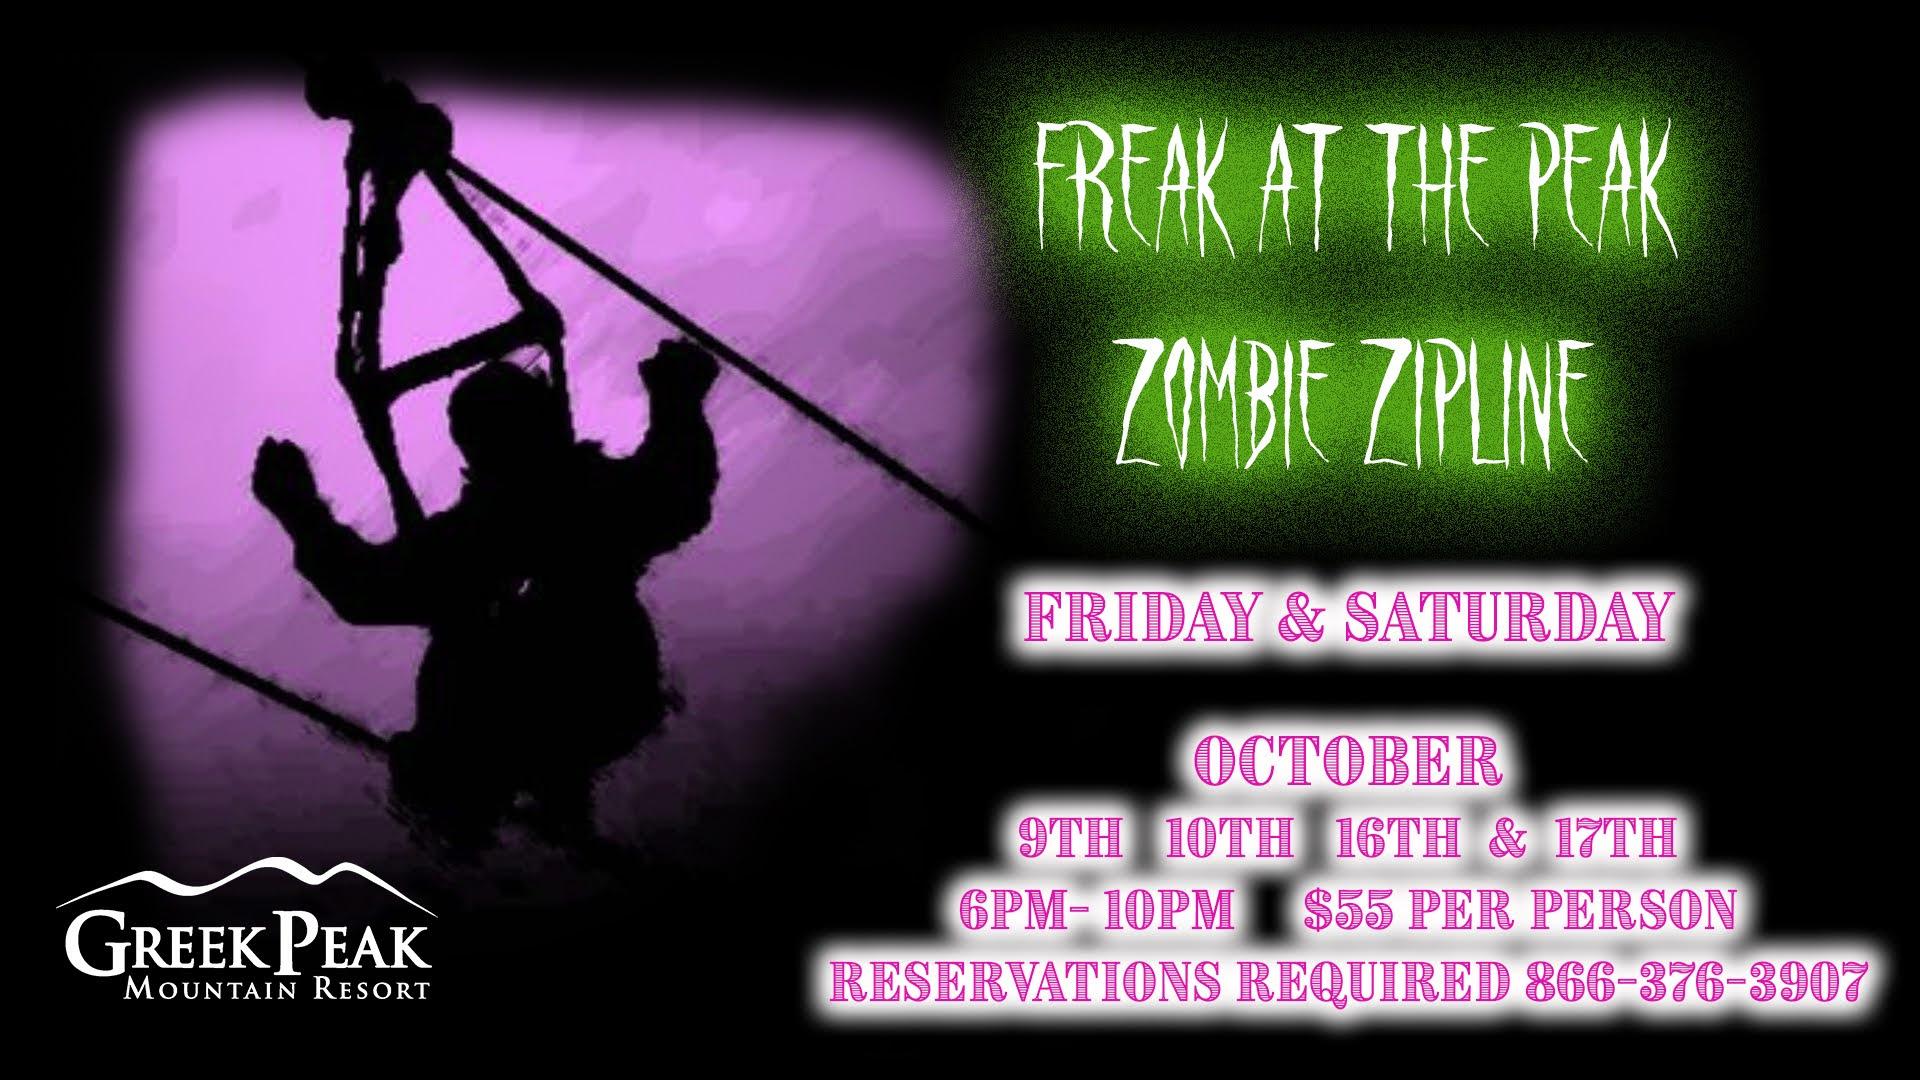 Freak at the Peak Zombie Zombie Zipline